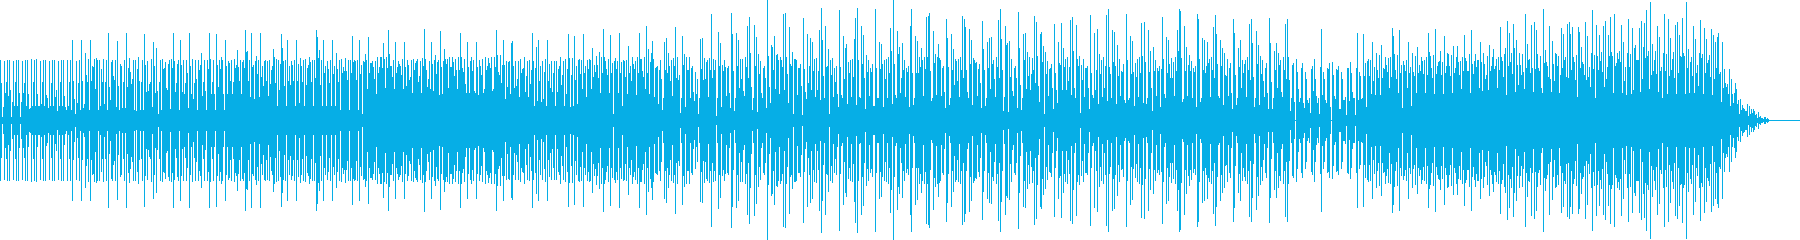 draho_northtの再生済みの波形